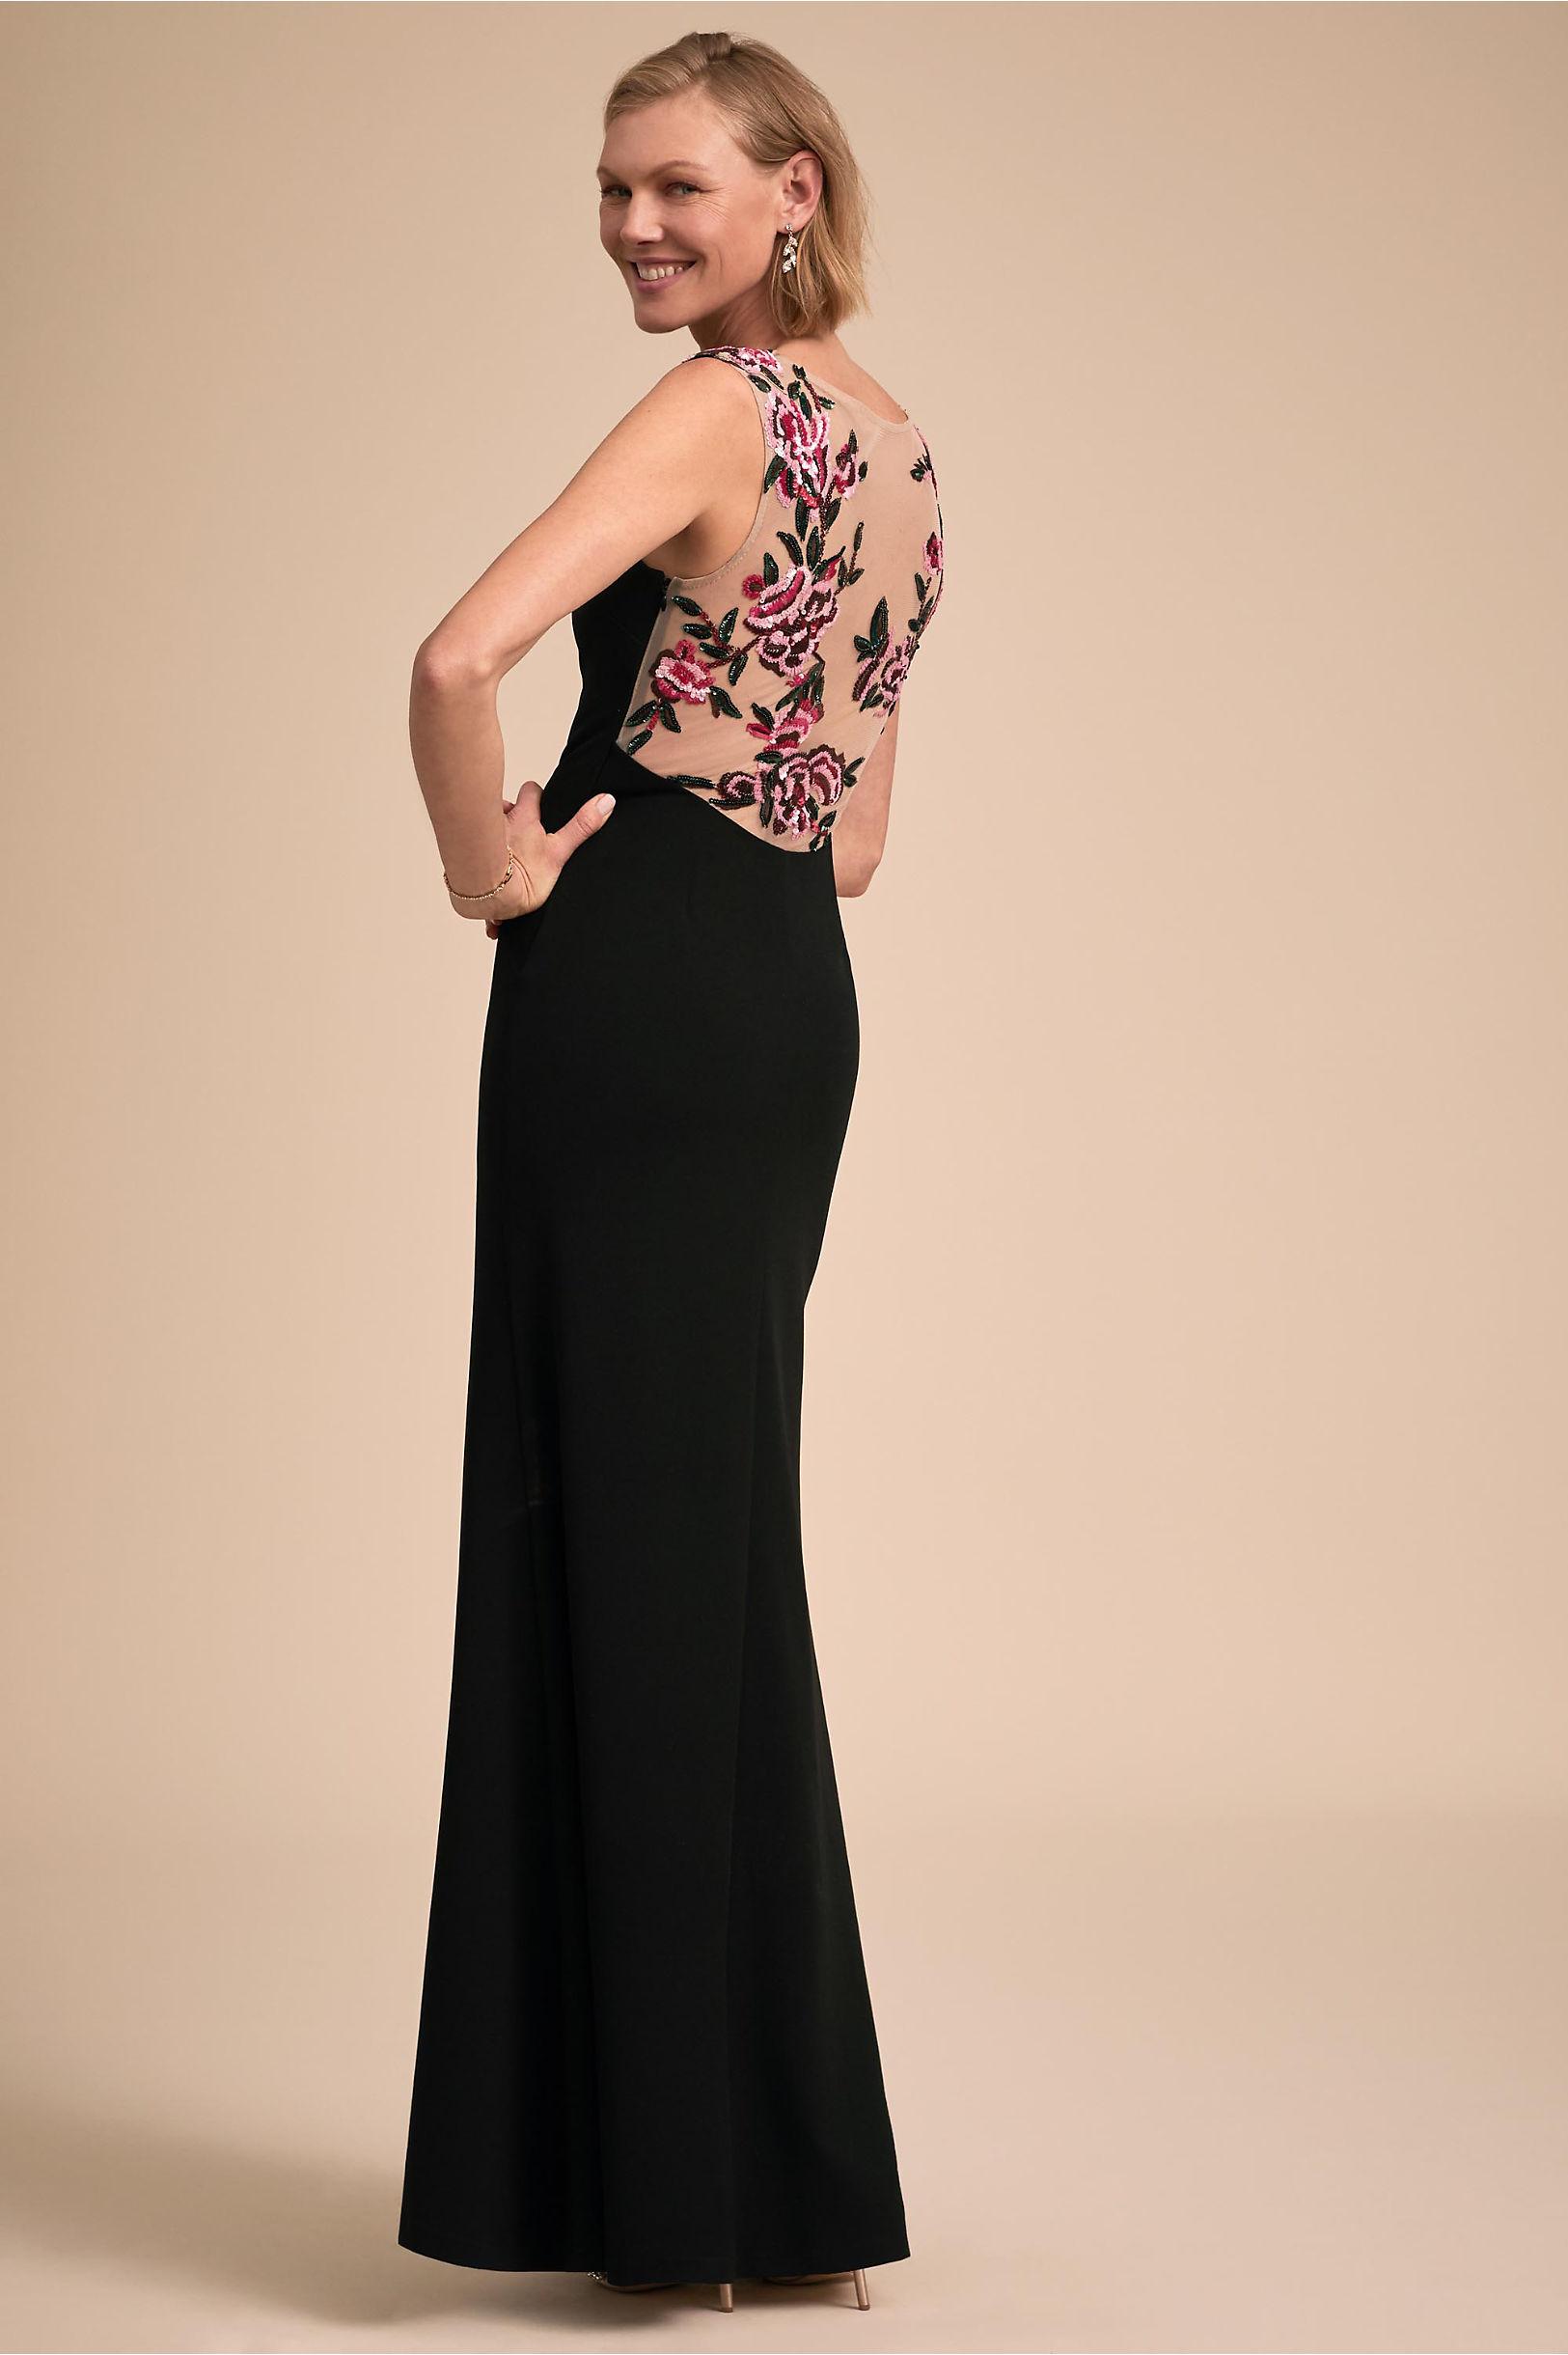 Hansa Dress in Sale   BHLDN